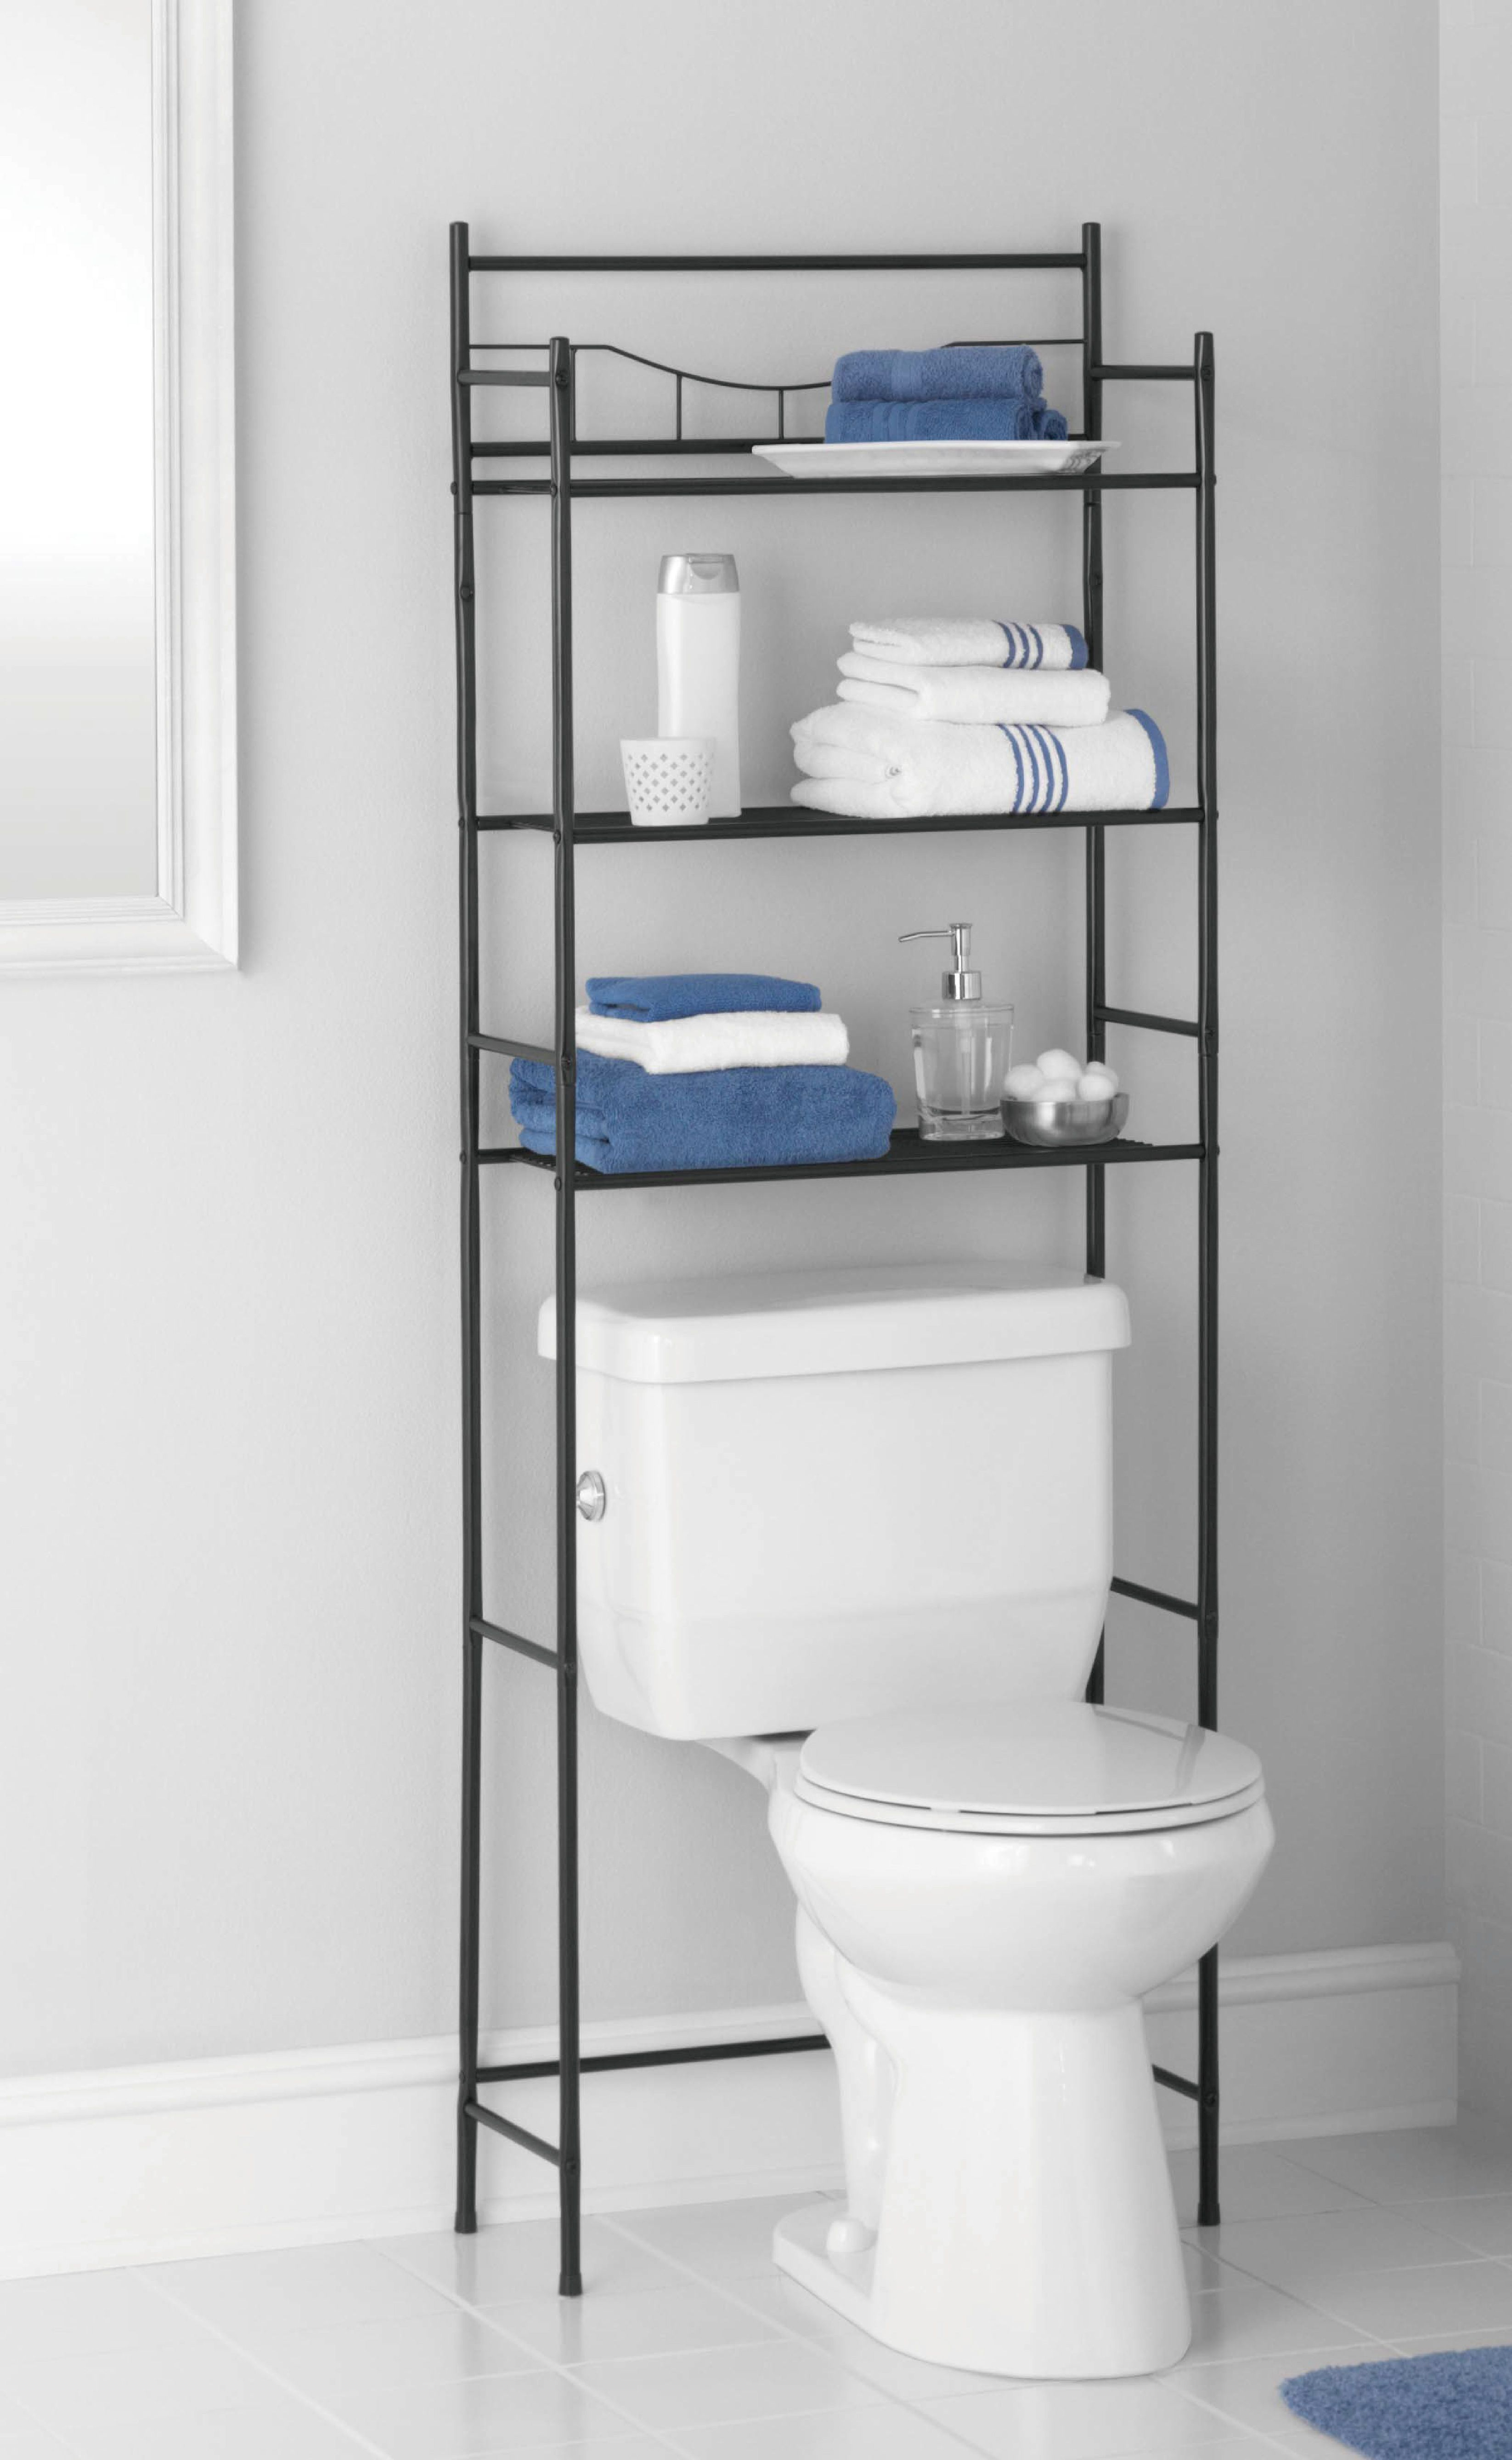 Bathroom Space Saver Makes Up Your Modern Home With Images Bathroom Space Saver Small Bathroom Storage Bathroom Organisation